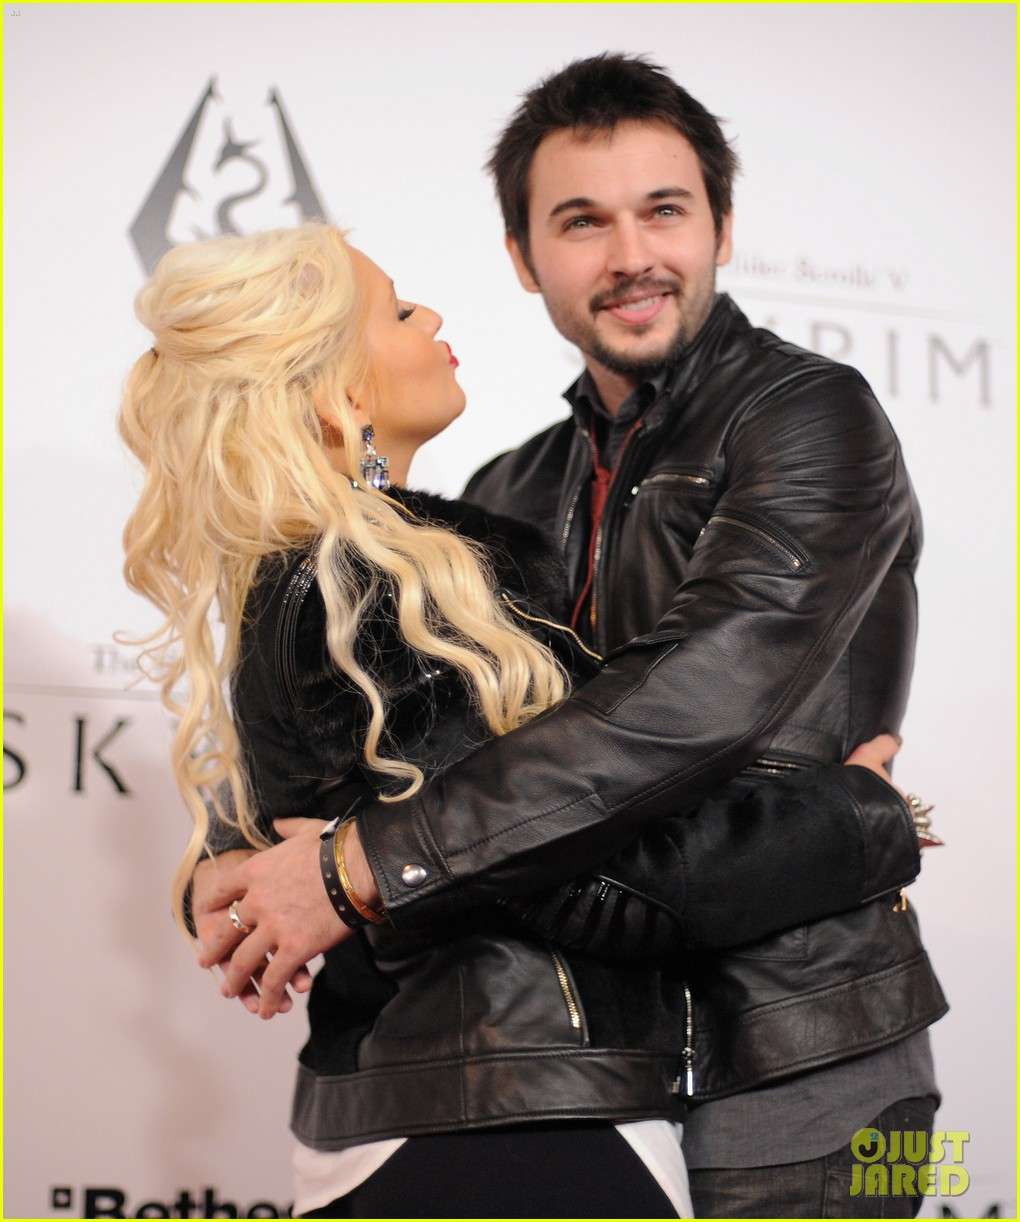 [Fotos+Video] Christina Aguilera: Elder Scrolls V: Skyrim Launch! 2011 Christina-aguilera-matthew-rutler-skyrim-launch-08